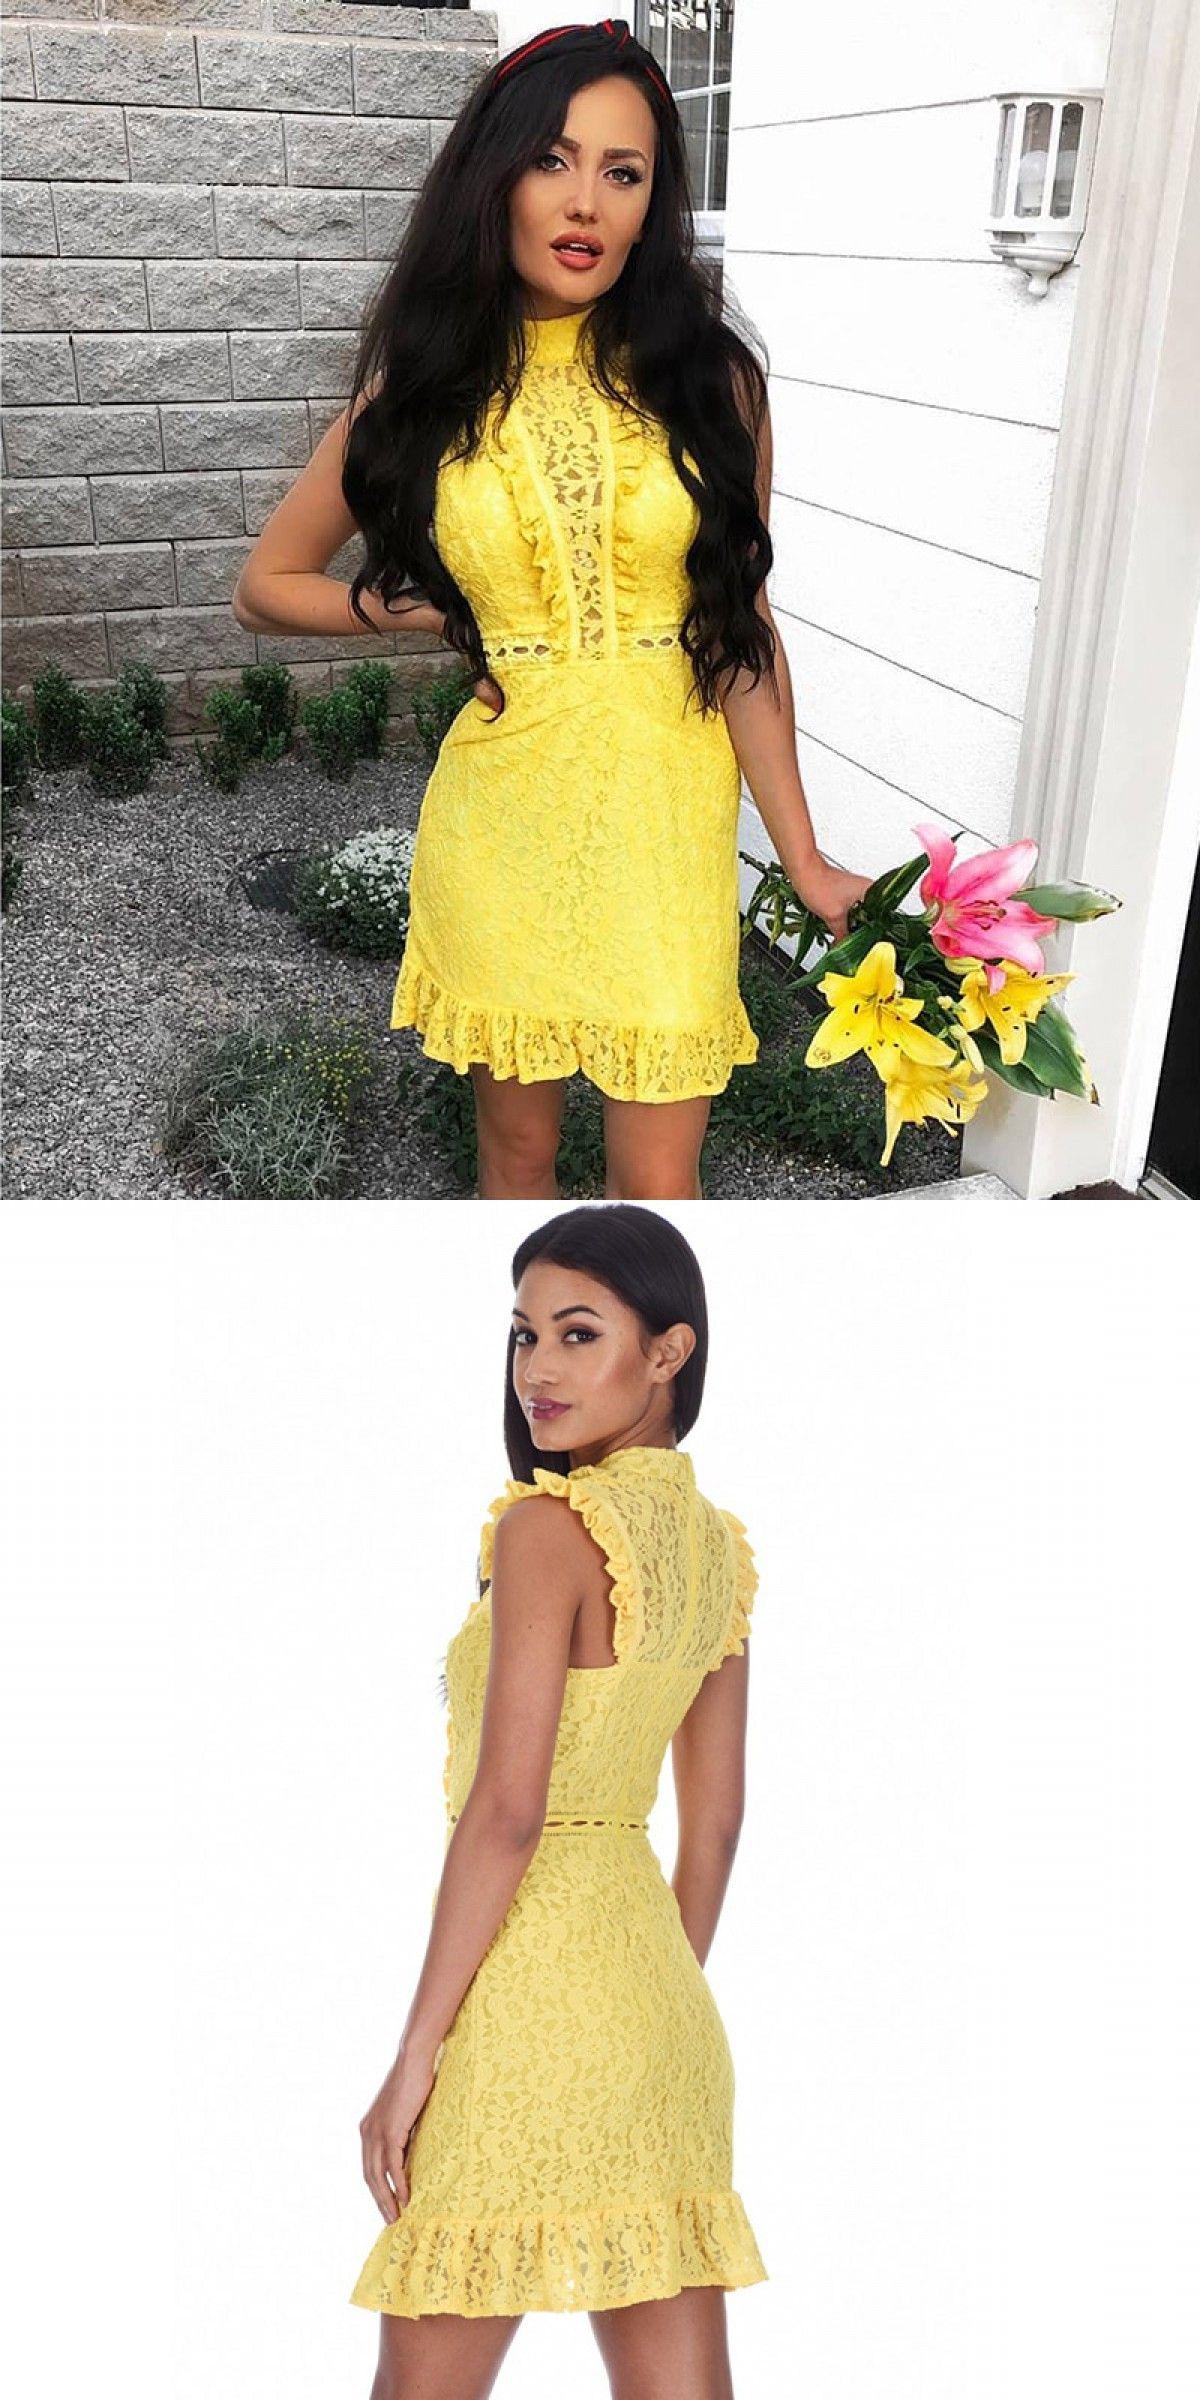 Sheath high neck yellow lace homecoming dress homecoming dresses